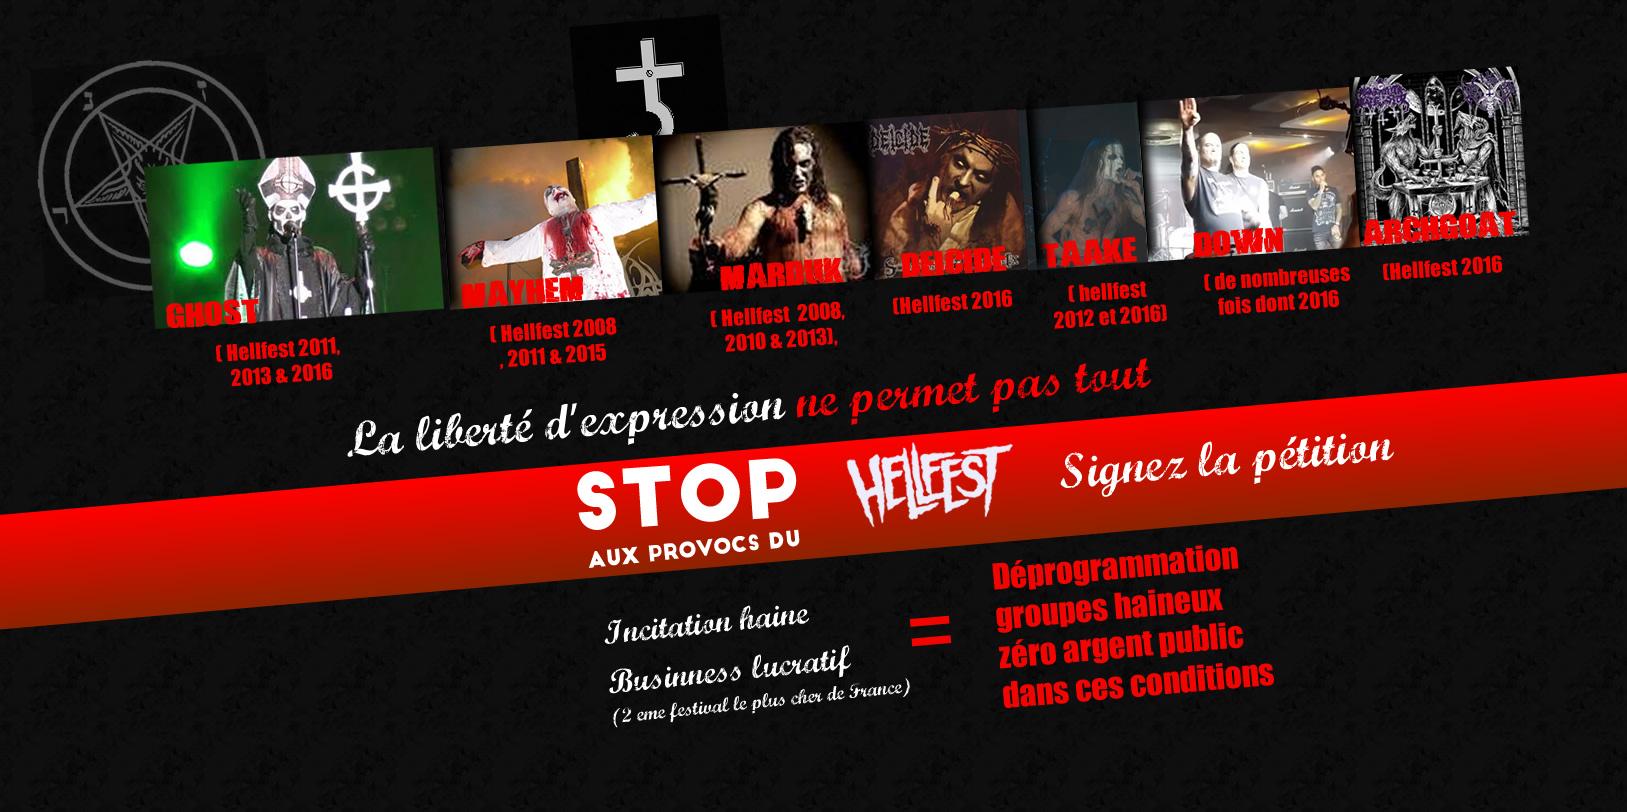 STOP HELLFEST PROVOCS